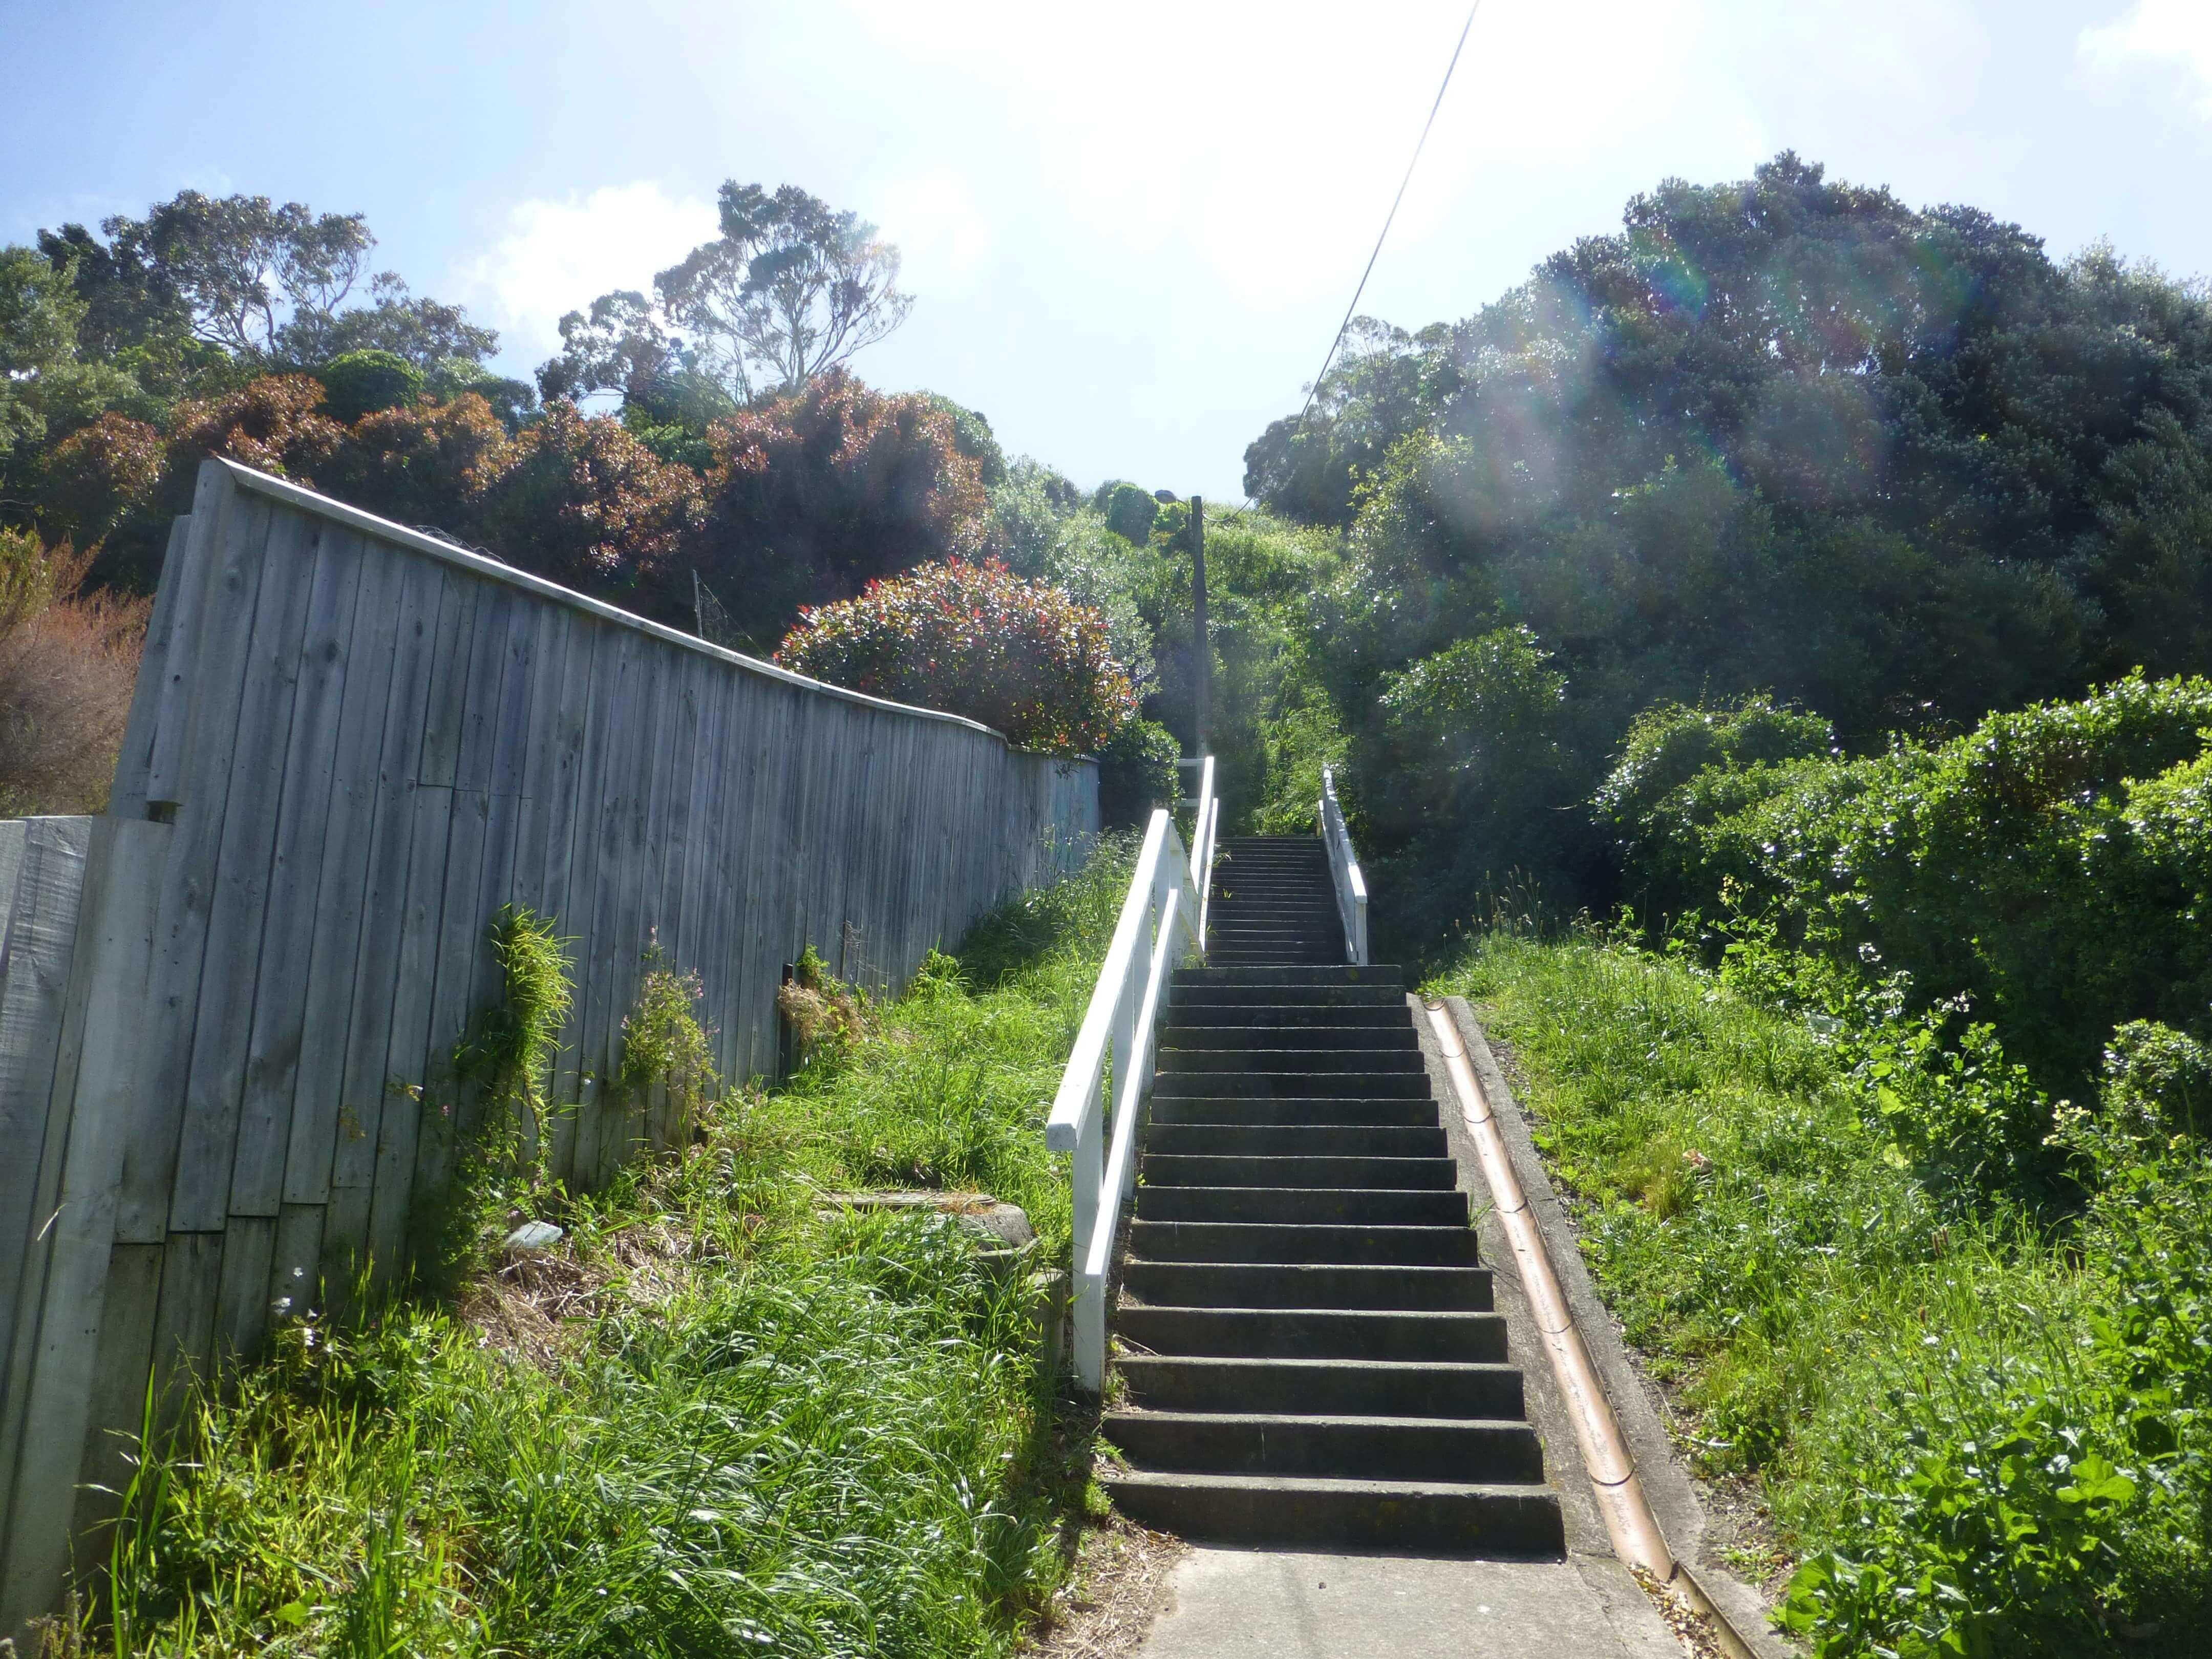 Wellington, in Miramar auf dem Weg zum Weta Shop, Weit-weg.reisen, 20